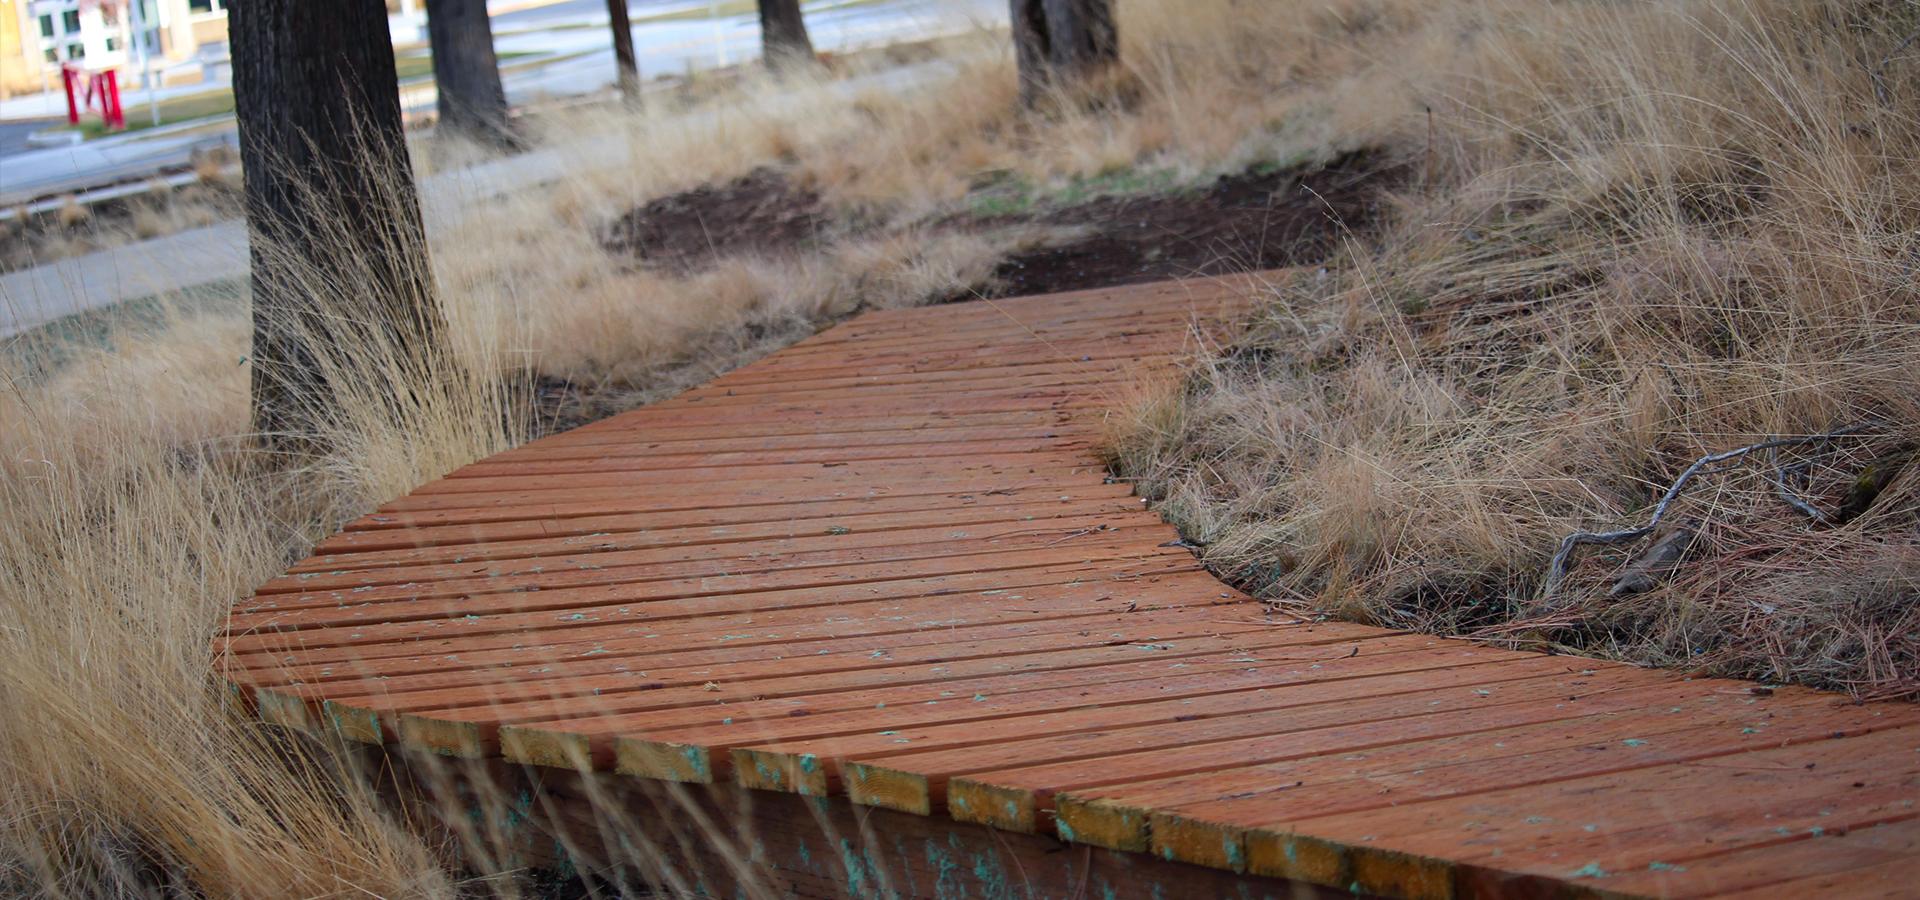 Stone-Creek-Park-Bike-Skills-Boardwalk-Feature